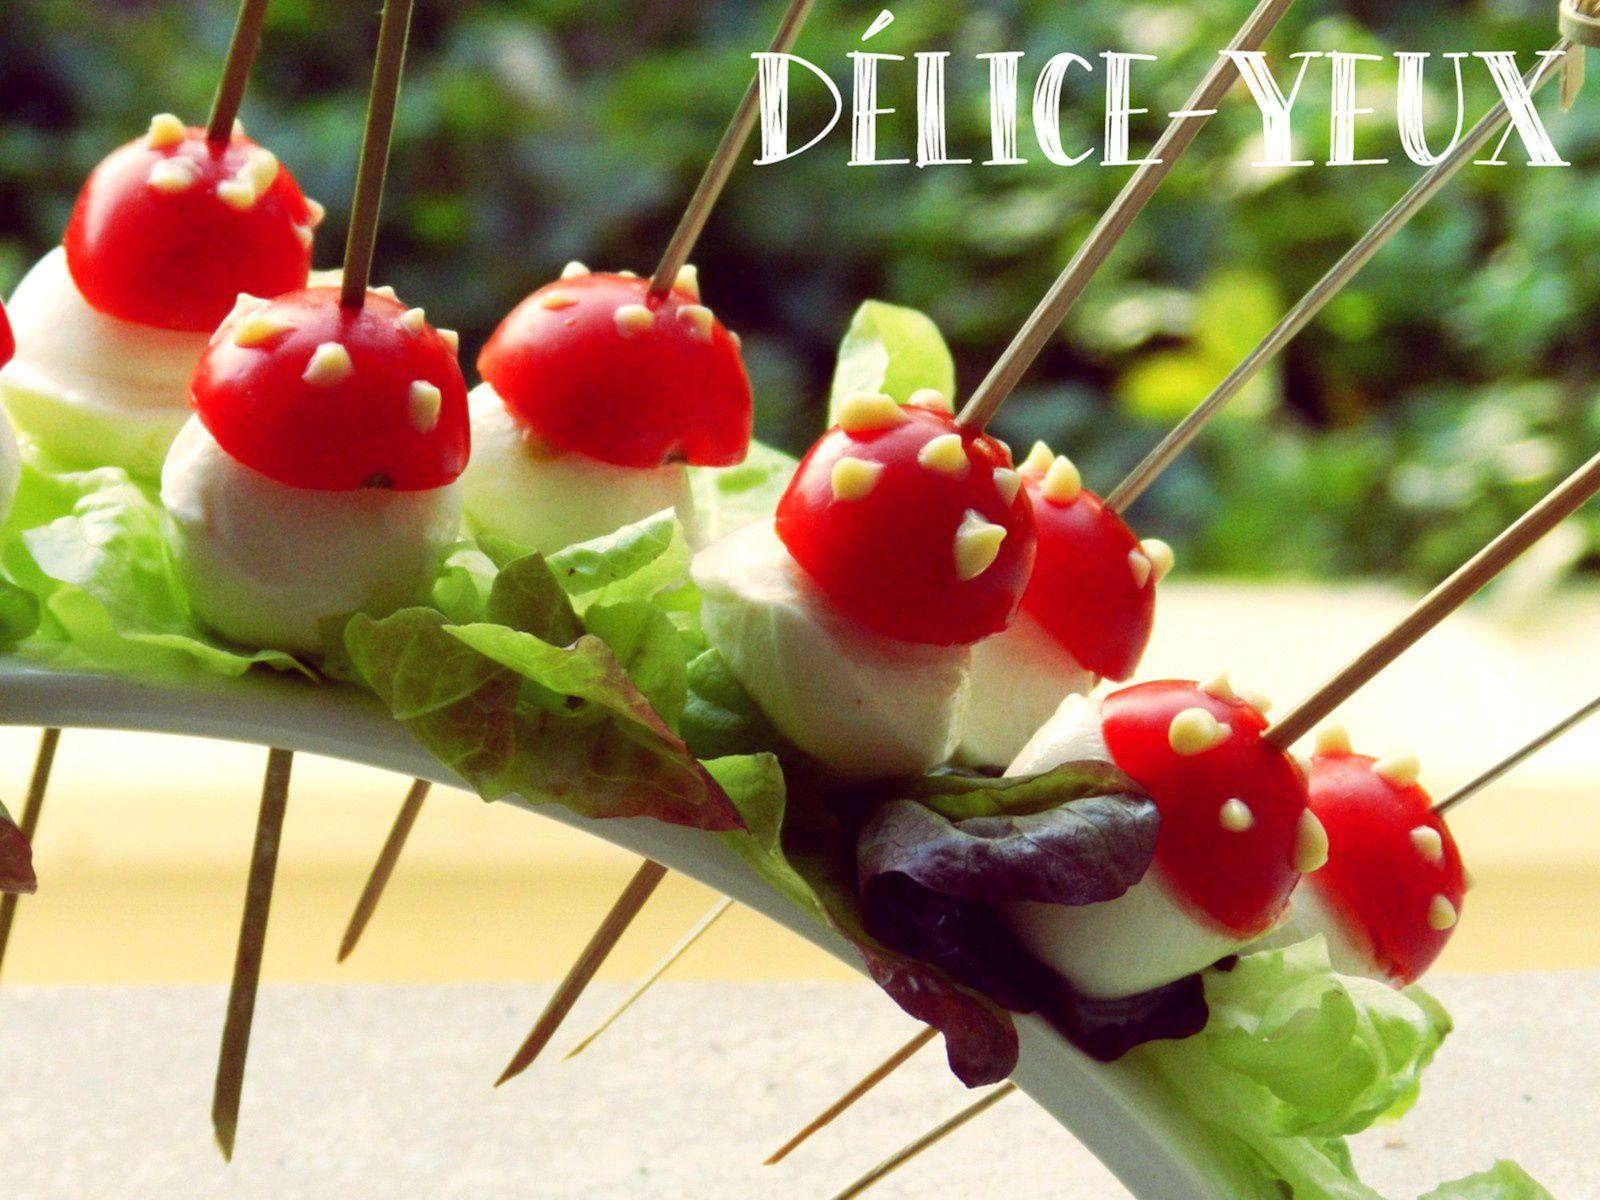 Champignons vénéneux (Tomates & Mozzarella) {Halloween}